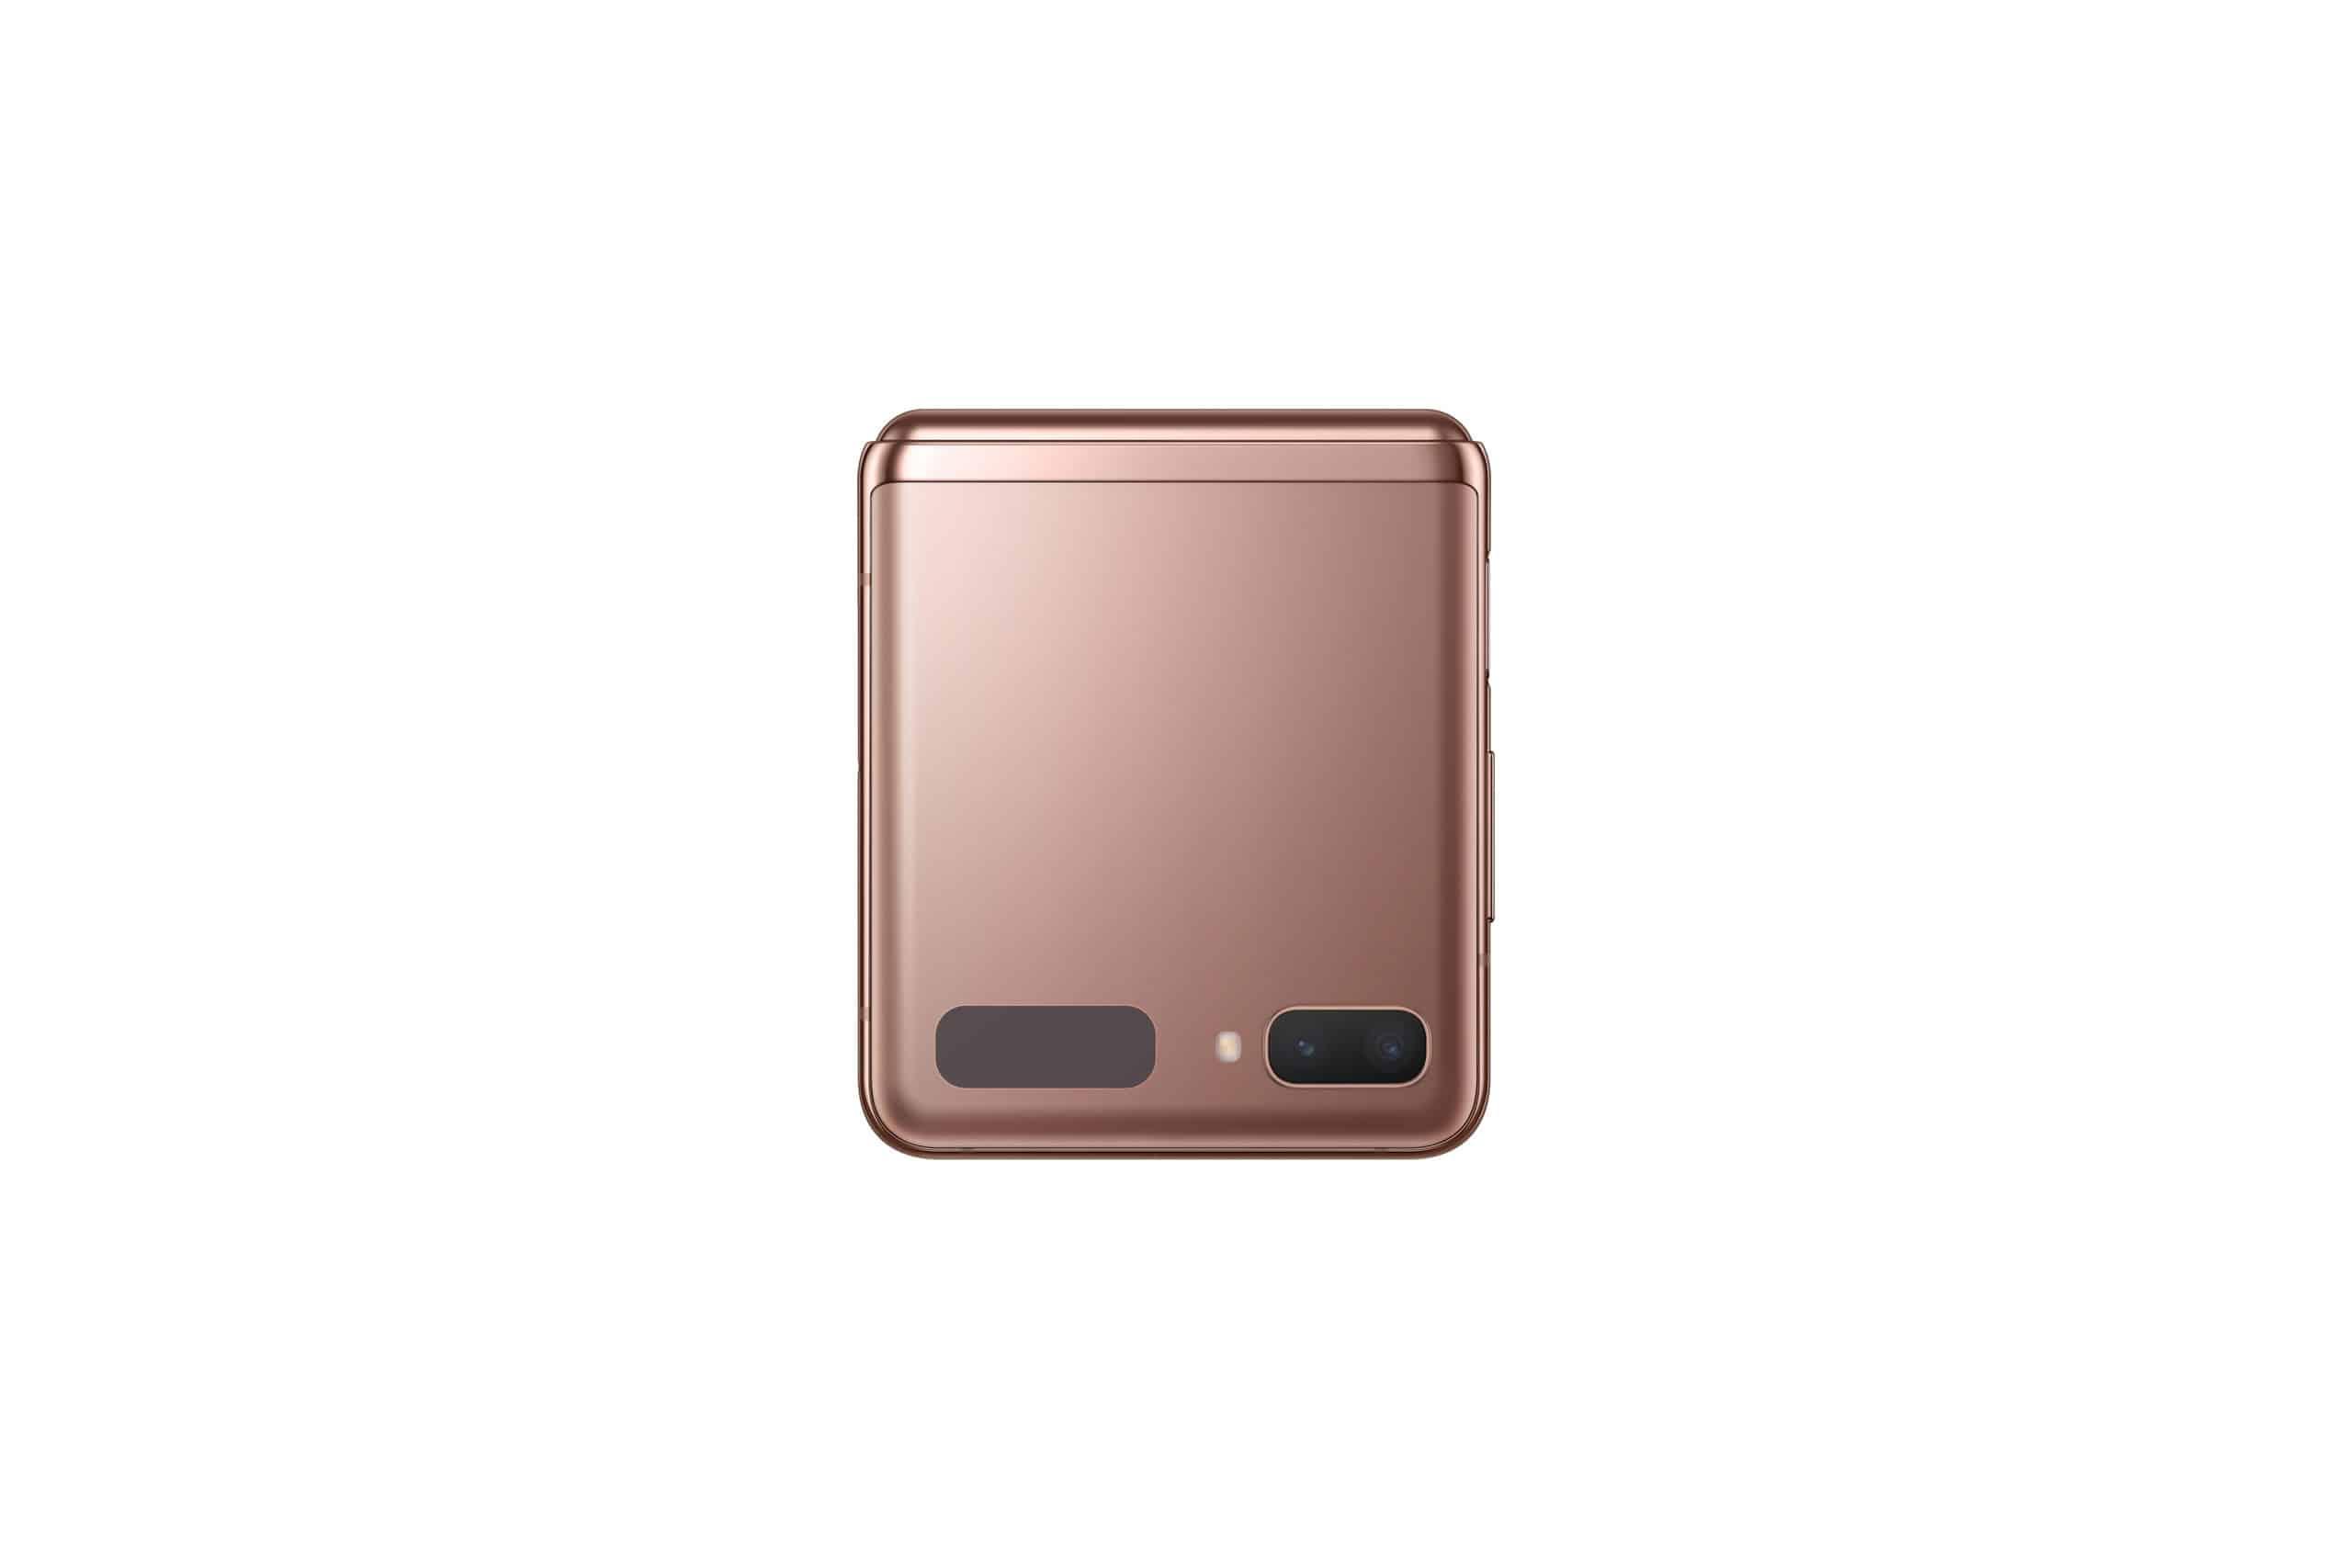 Galaxy Z Flip 5G Mystic Bronze Back Closed